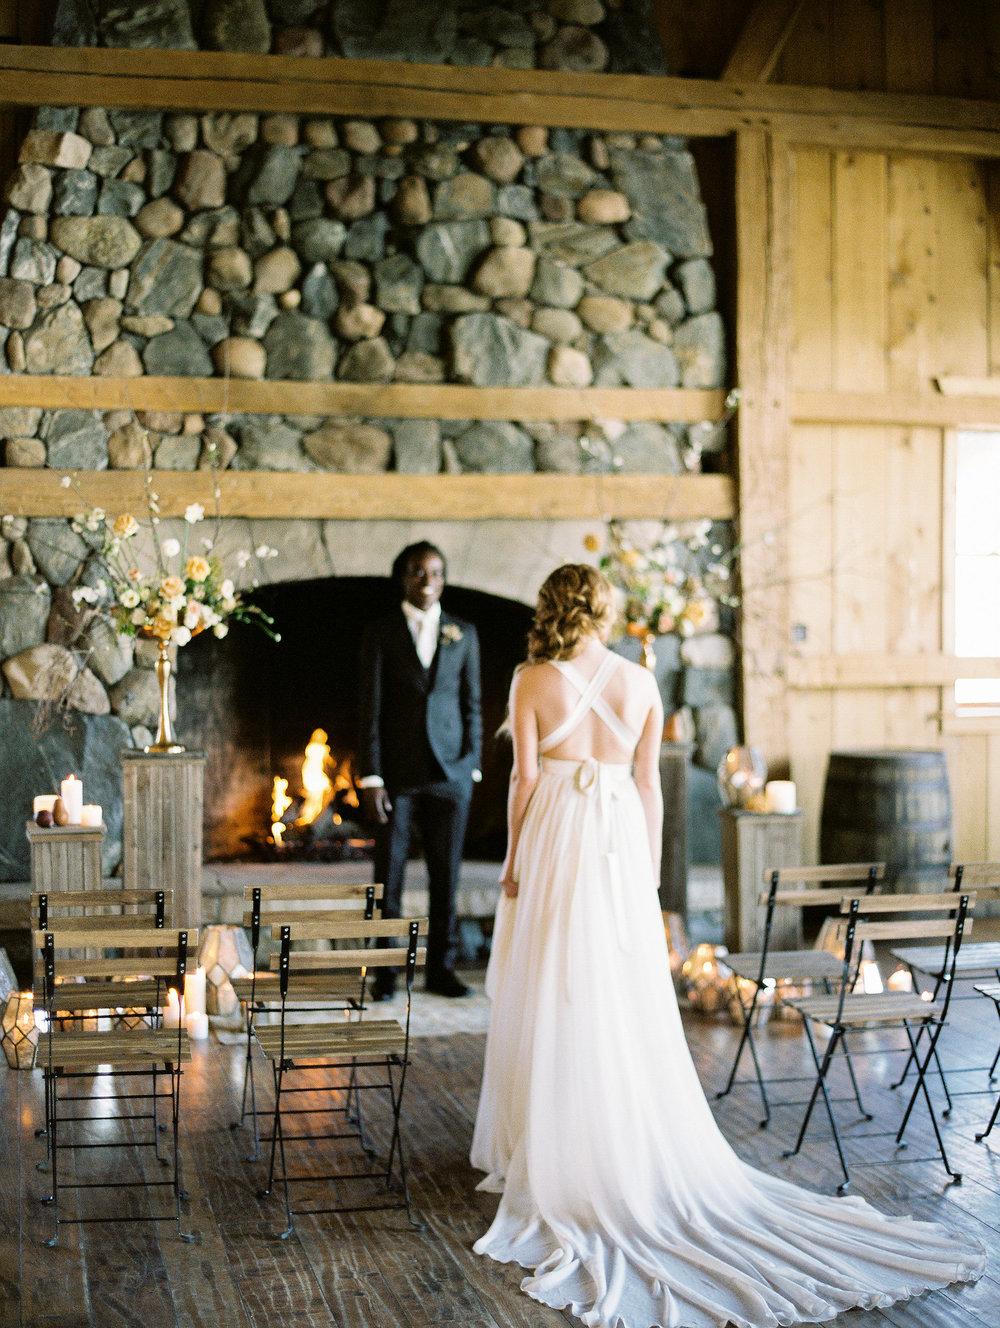 Dani-Cowan-Photography-Devils-Thumb-Ranch-Winter-Luxury-Wedding98.jpg